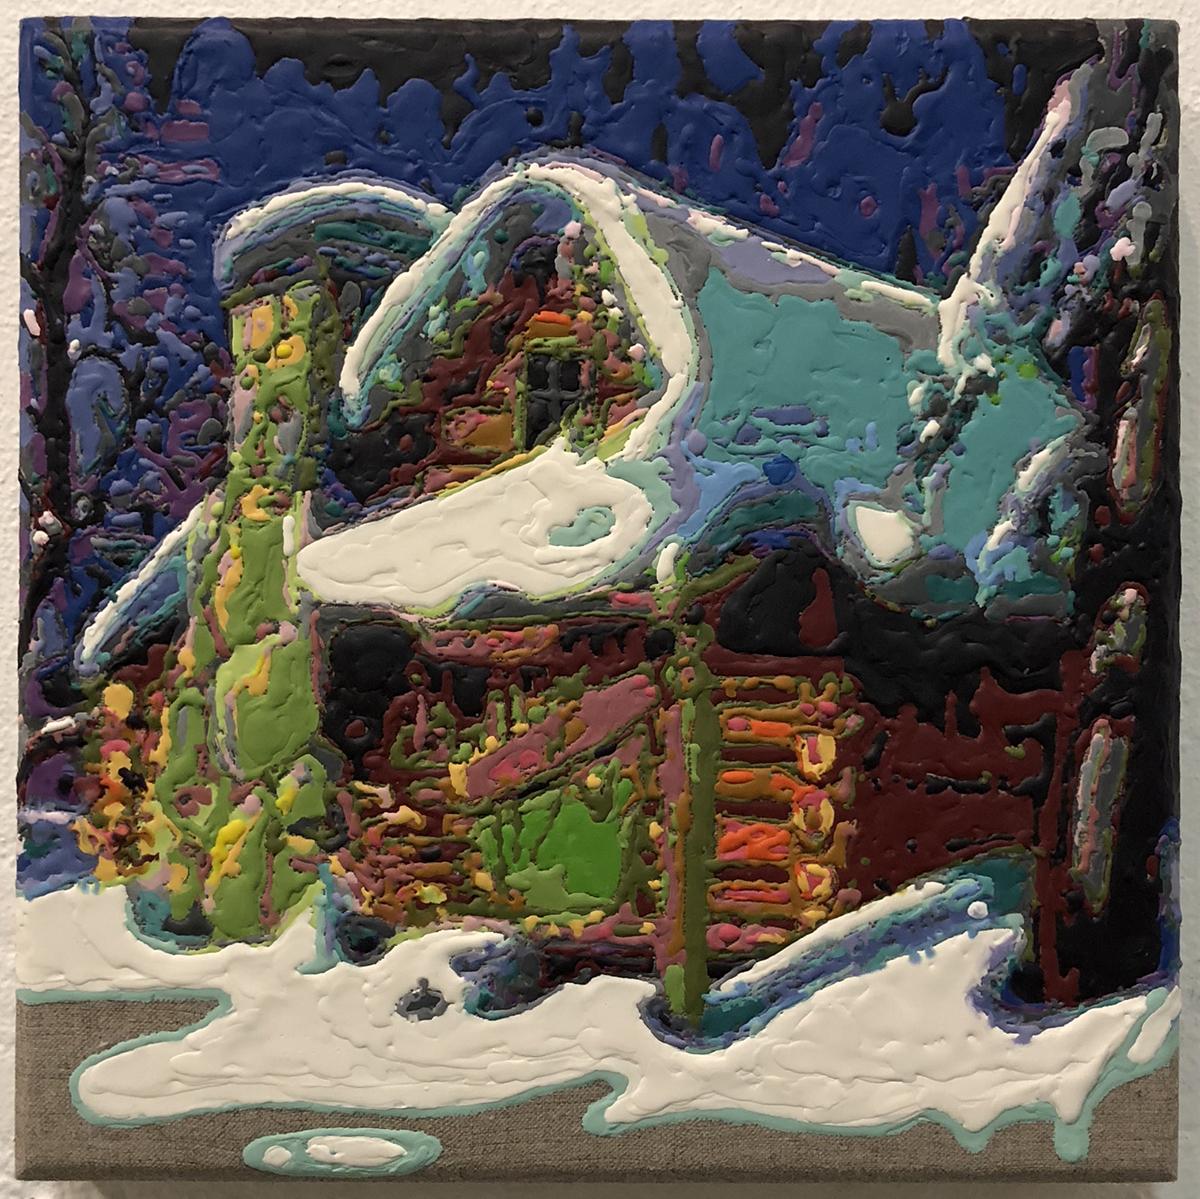 """snowed in"" by Waller Austin, crayon, gesso, linen, wood, 12x12in, 2017, $900"